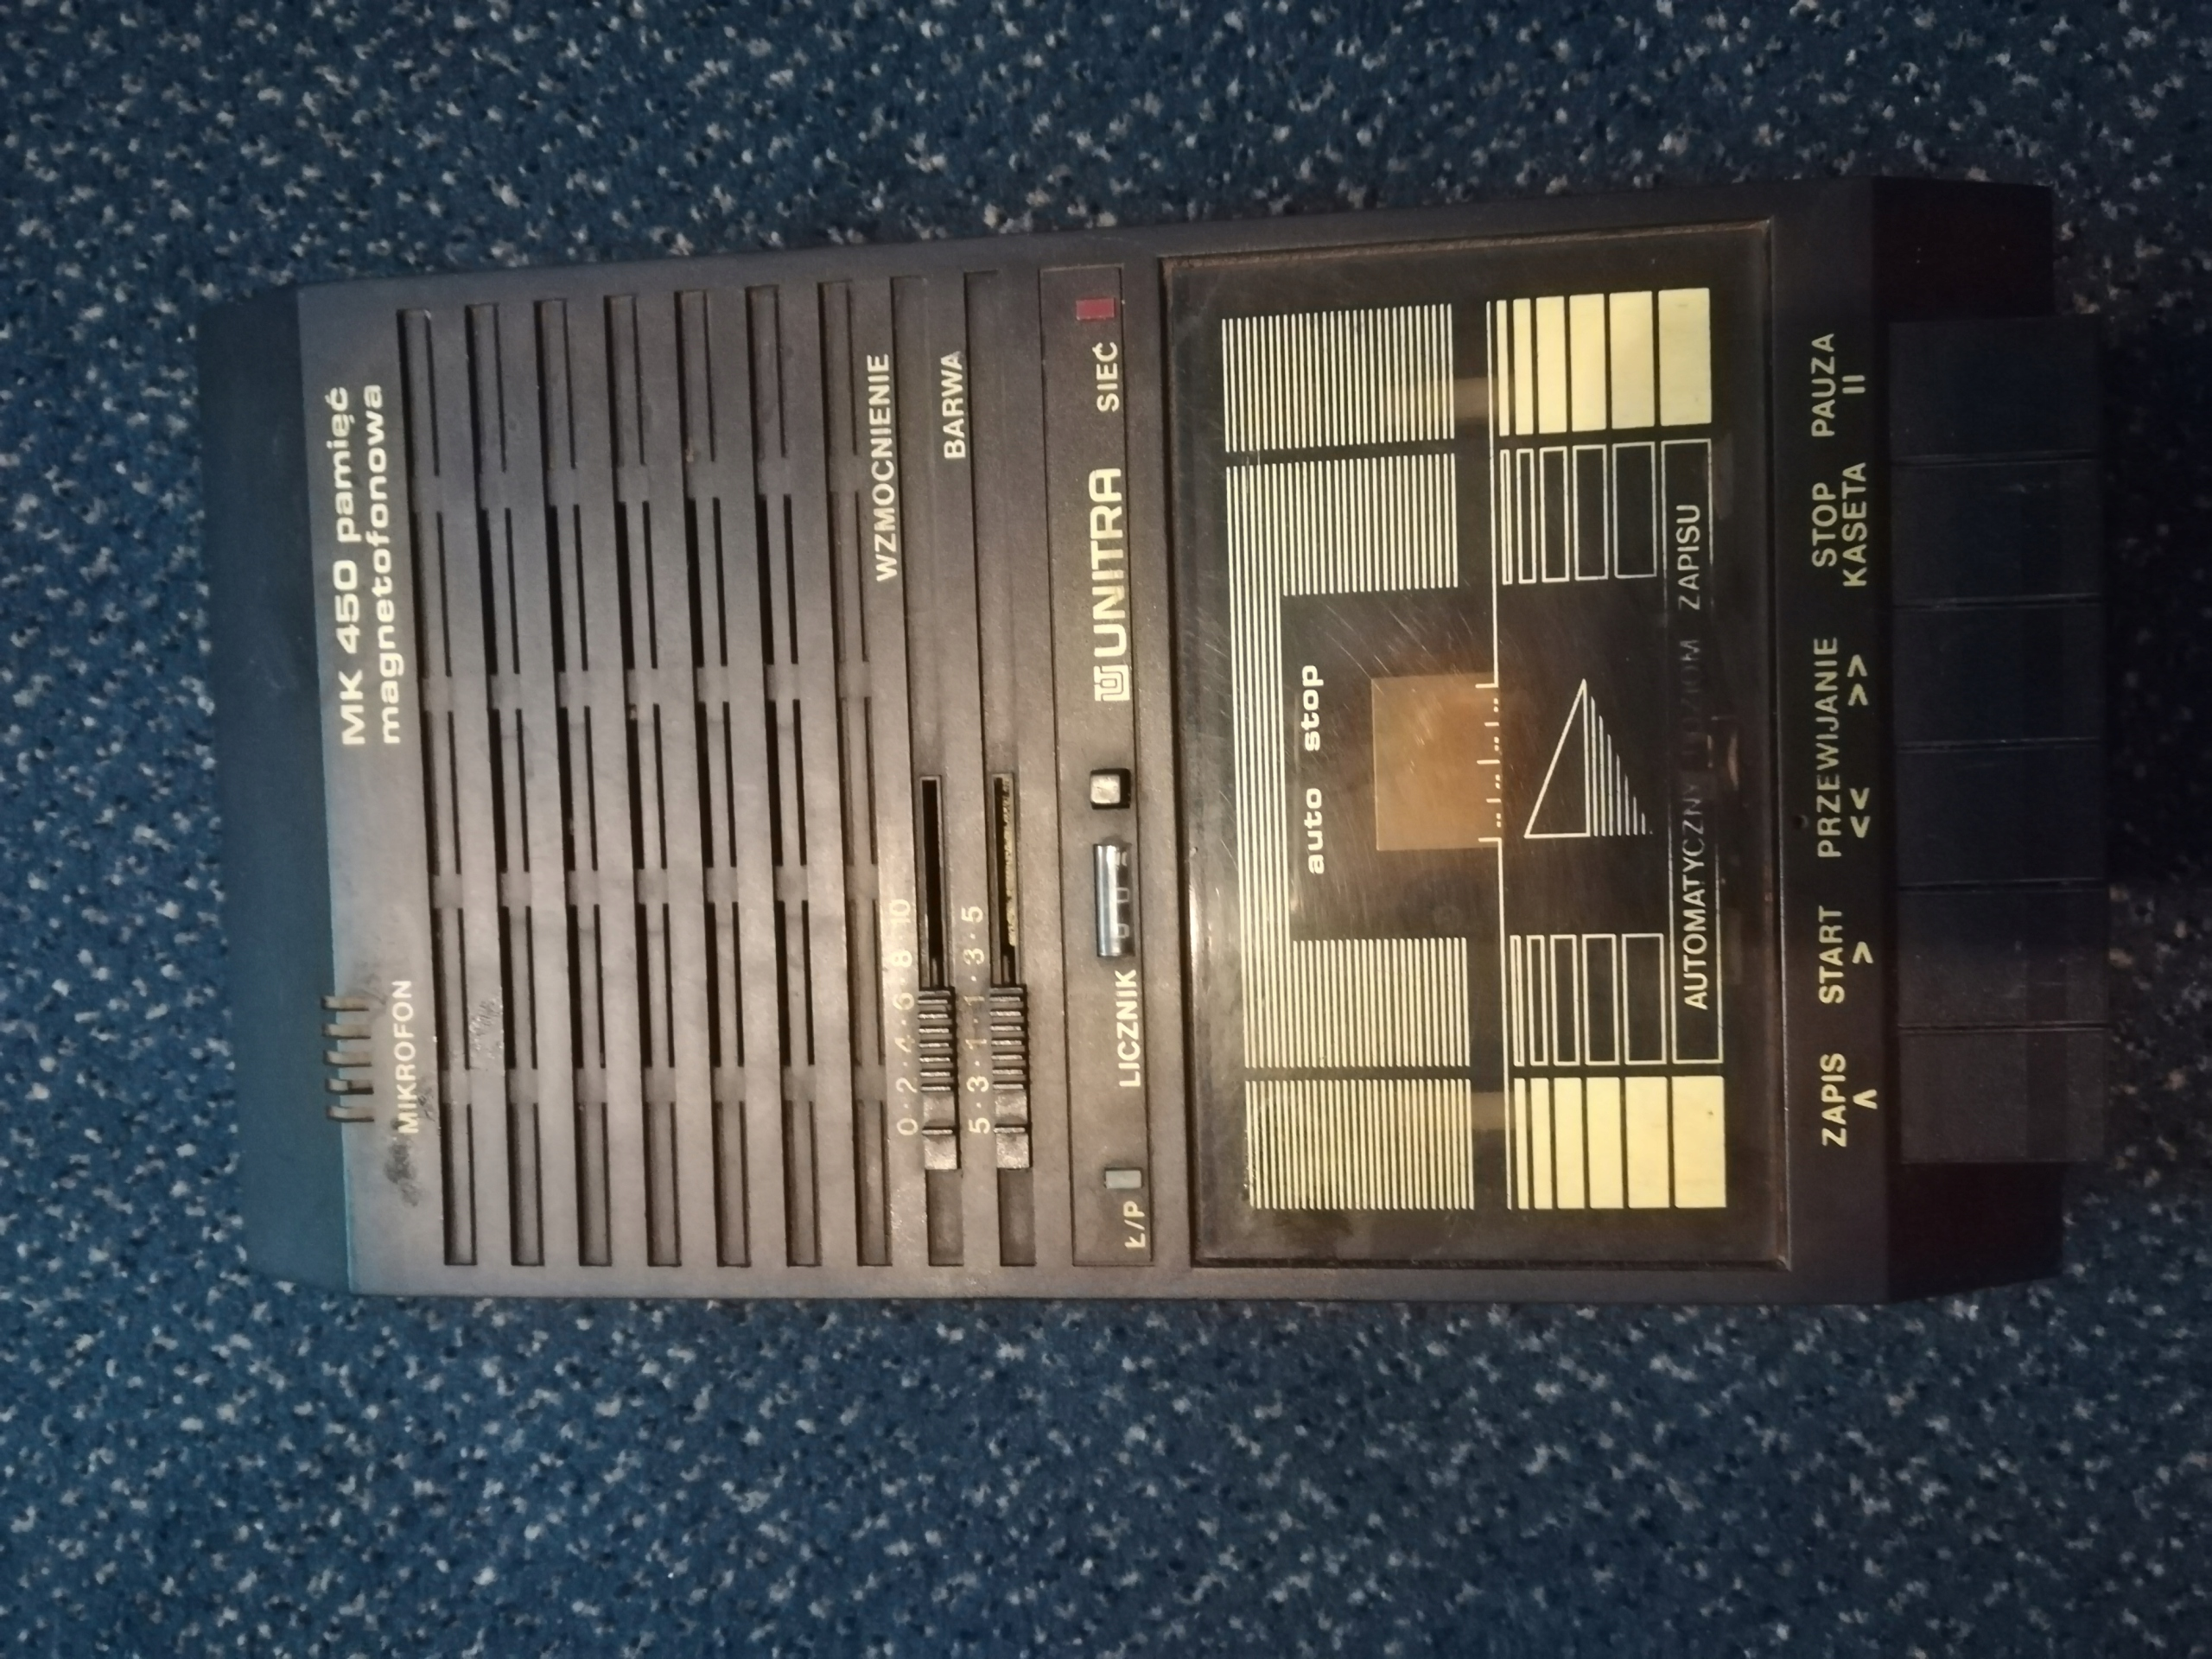 Magnetofon UNITRA MK 450 - pamięć magnetofonowa